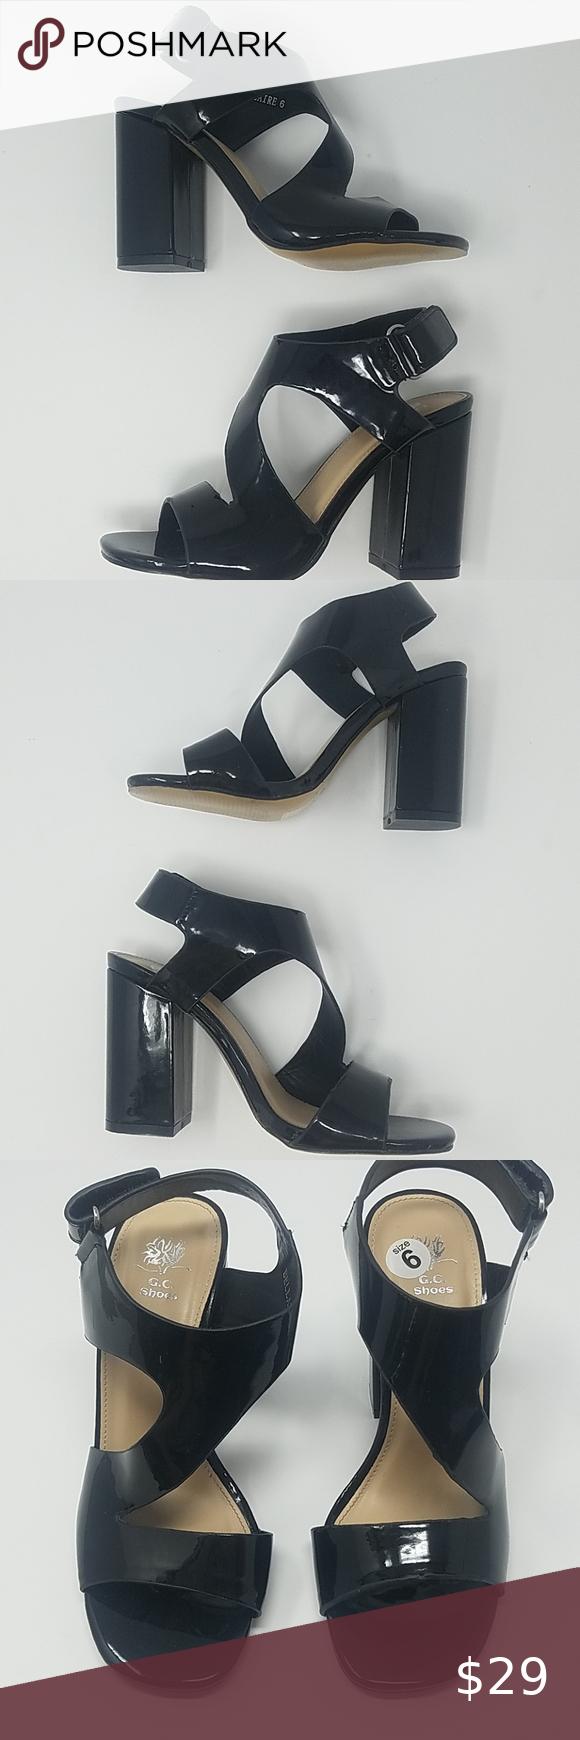 G.C. Shoes | Black Shiny Block Heel